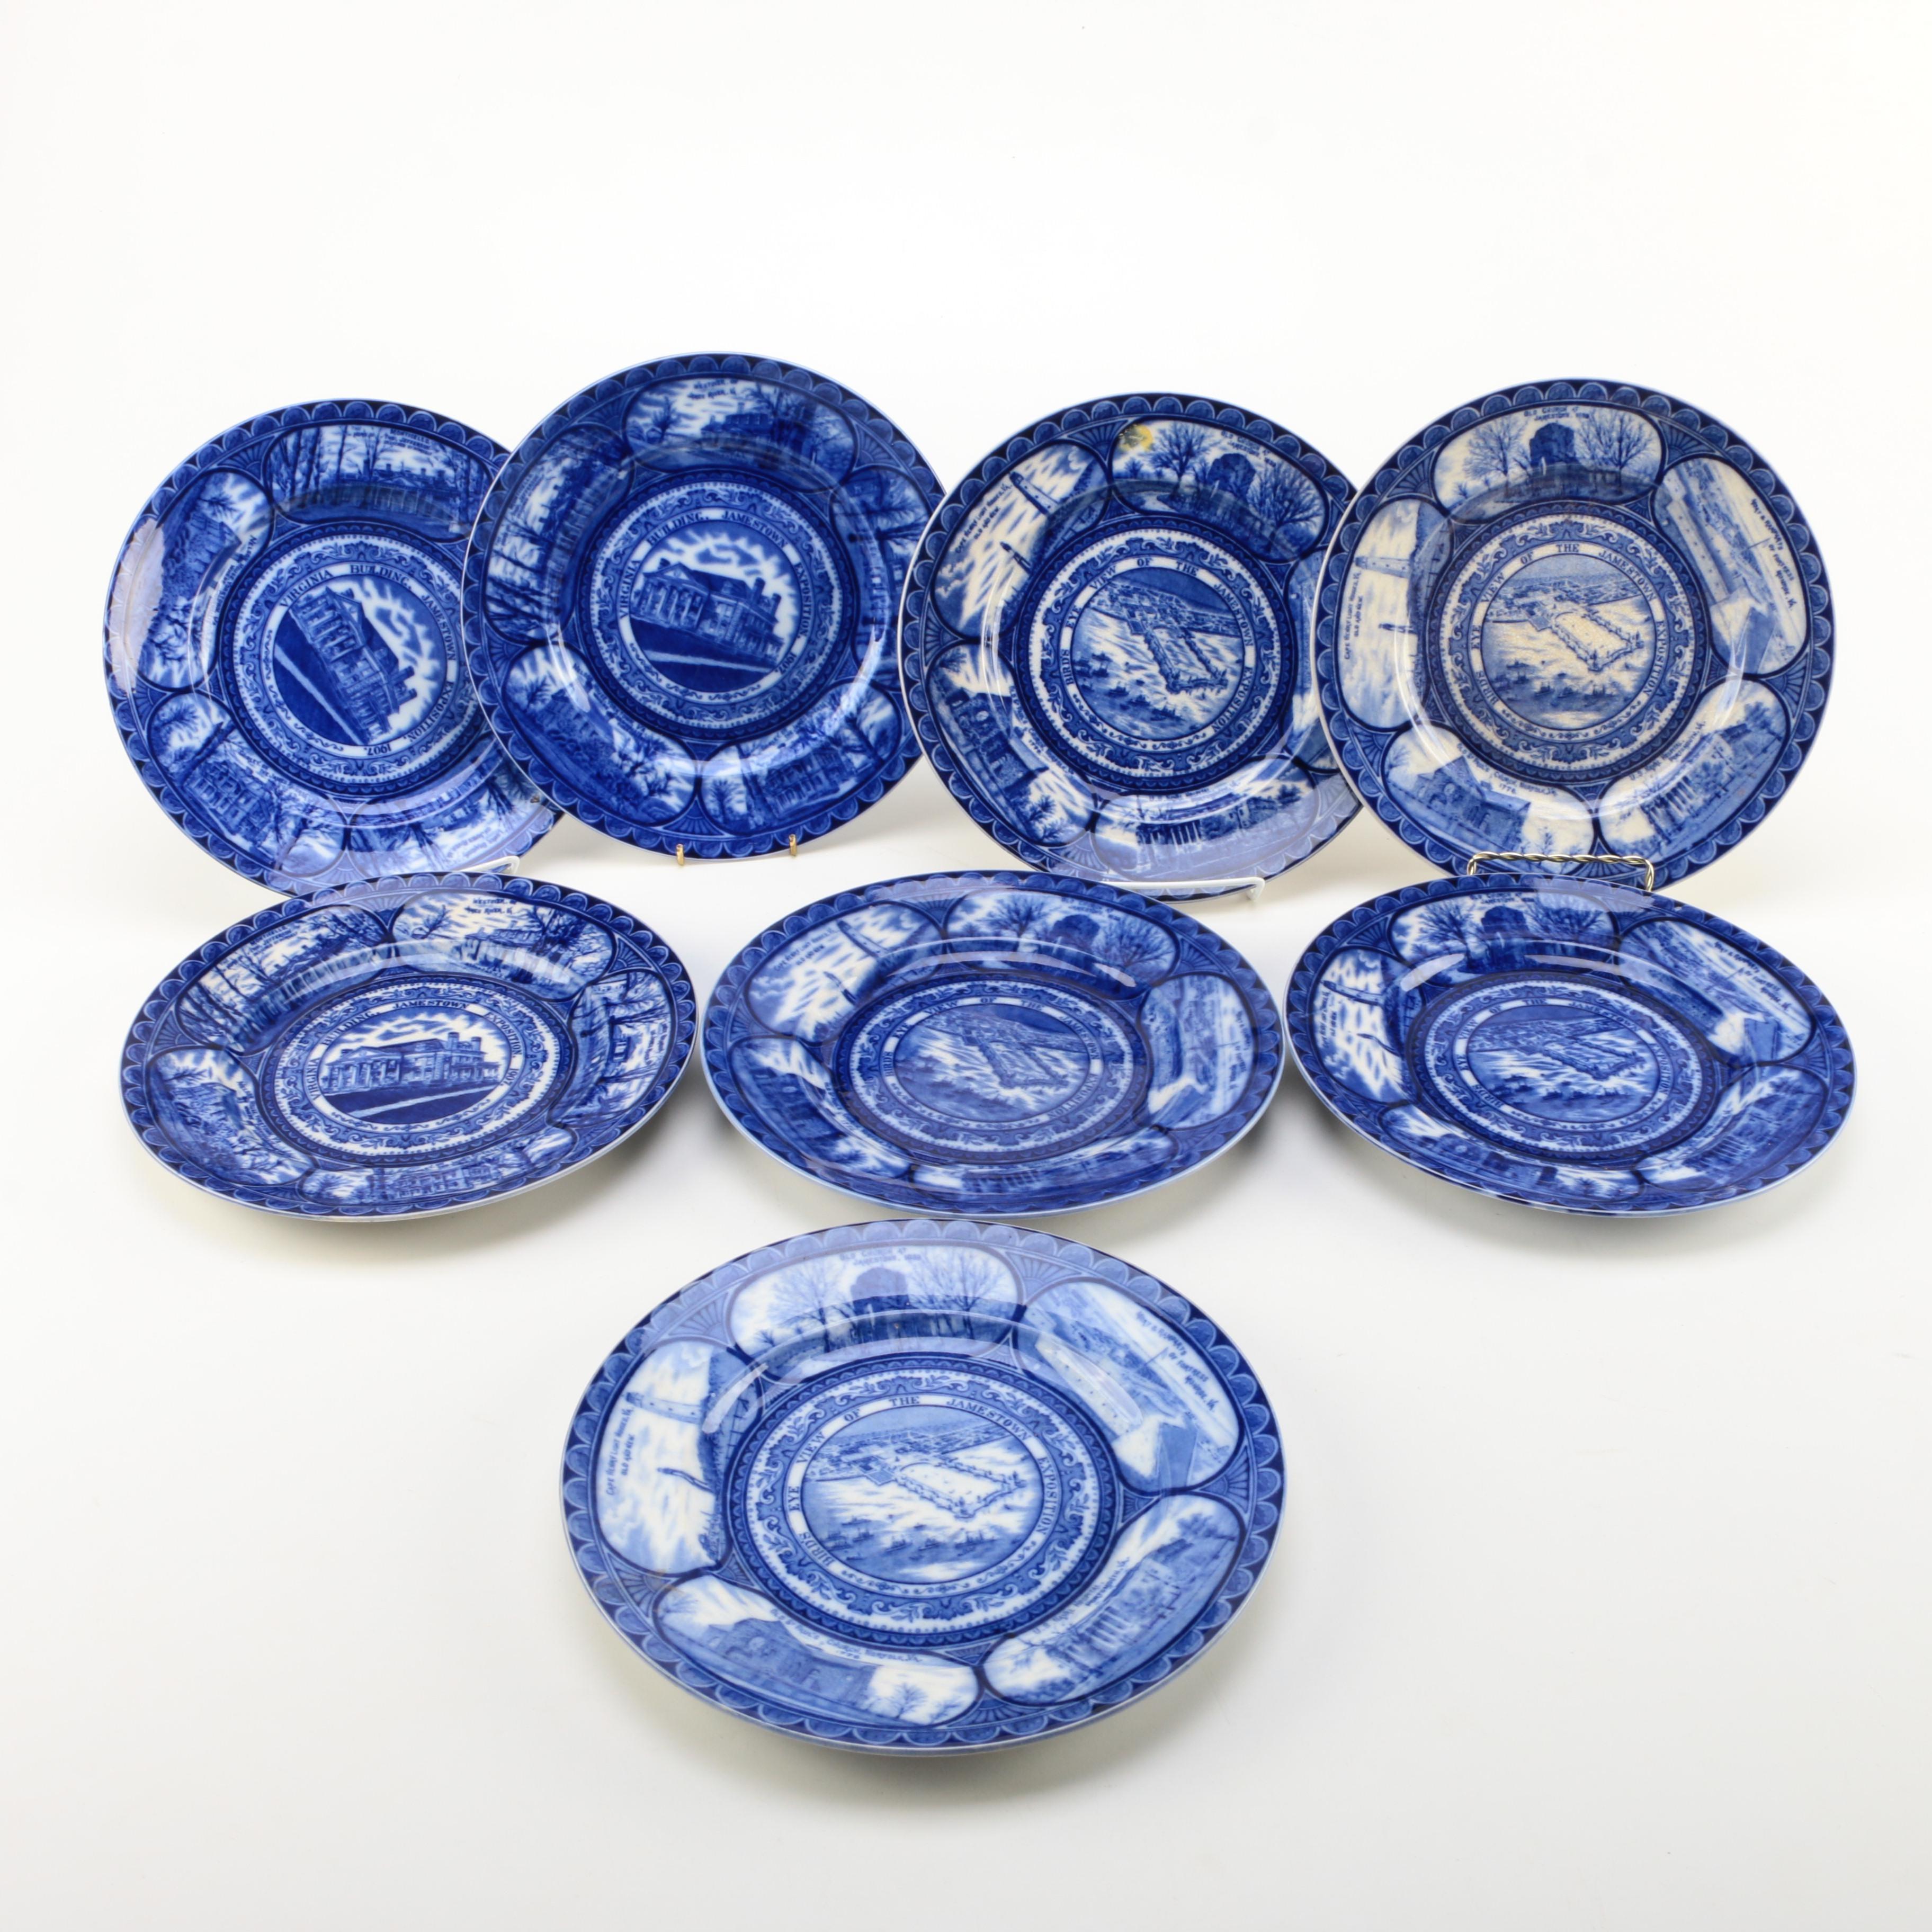 Antique Royal Staffordshire Jamestown Exposition Flow Blue Plates ... & Antique Royal Staffordshire Jamestown Exposition Flow Blue Plates : EBTH